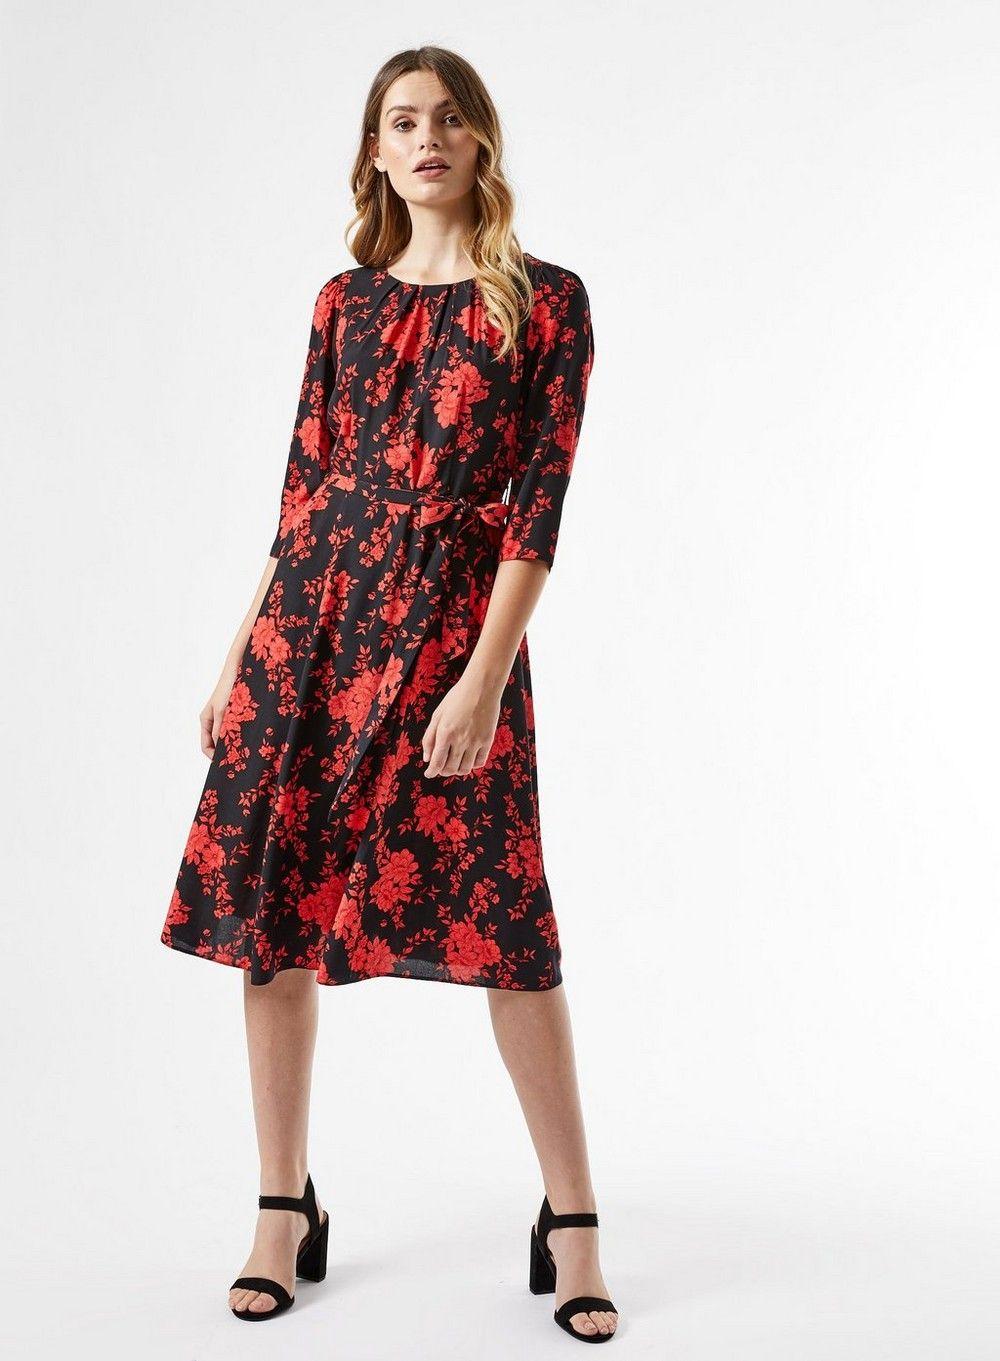 Dorothy Perkins Womens Billie and Blossom Black Floral Print Midi Skater Dress